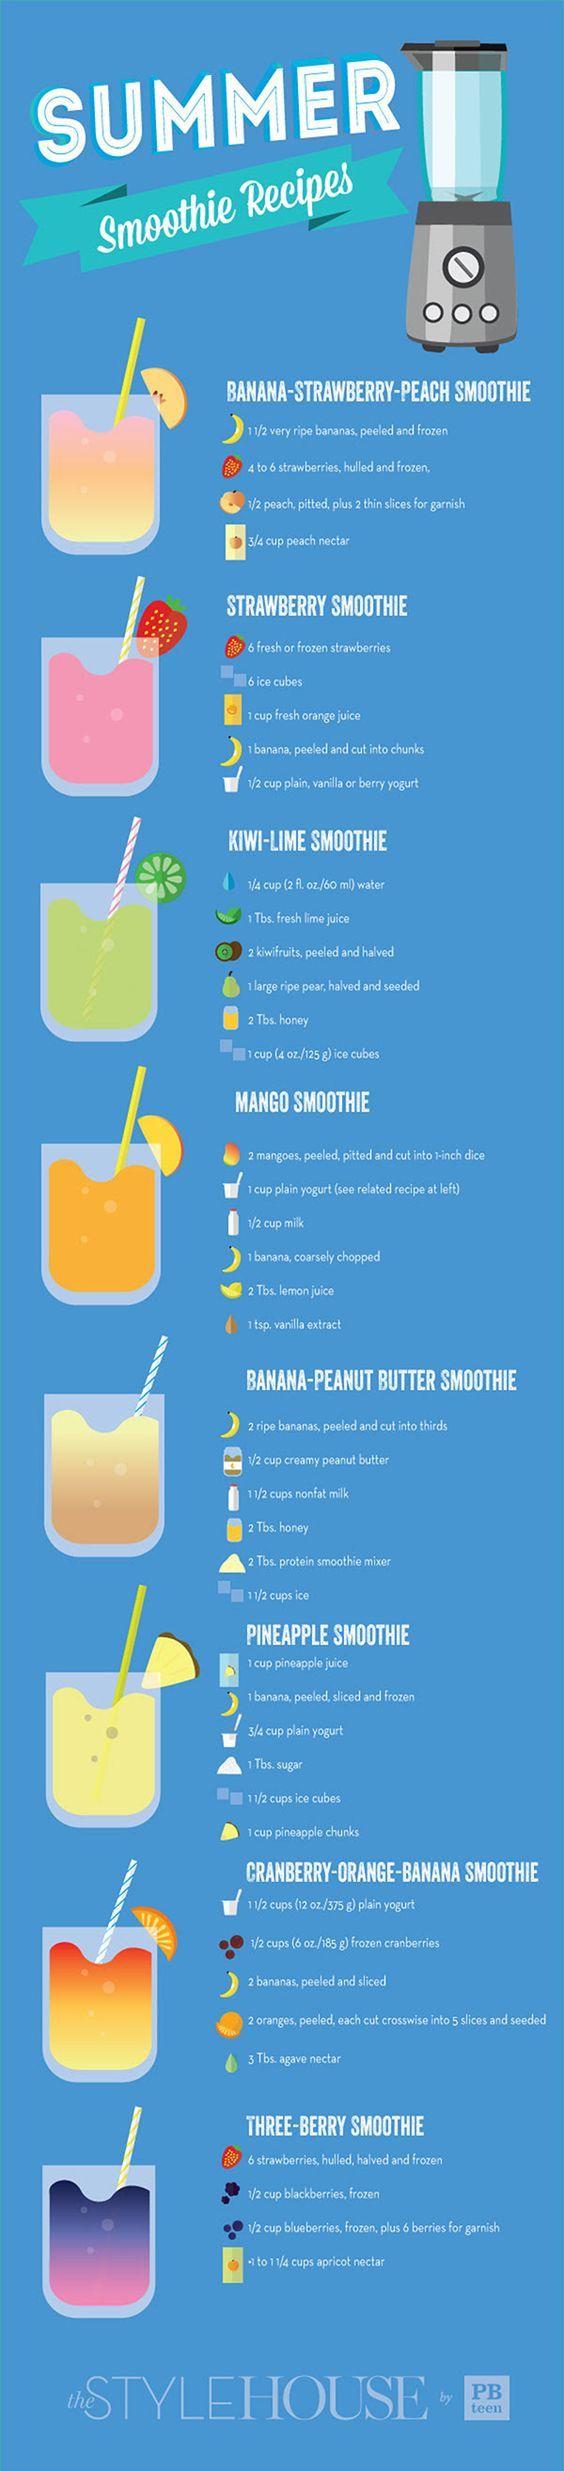 8 SummerSmoothies - Recipes - SavingsMania: